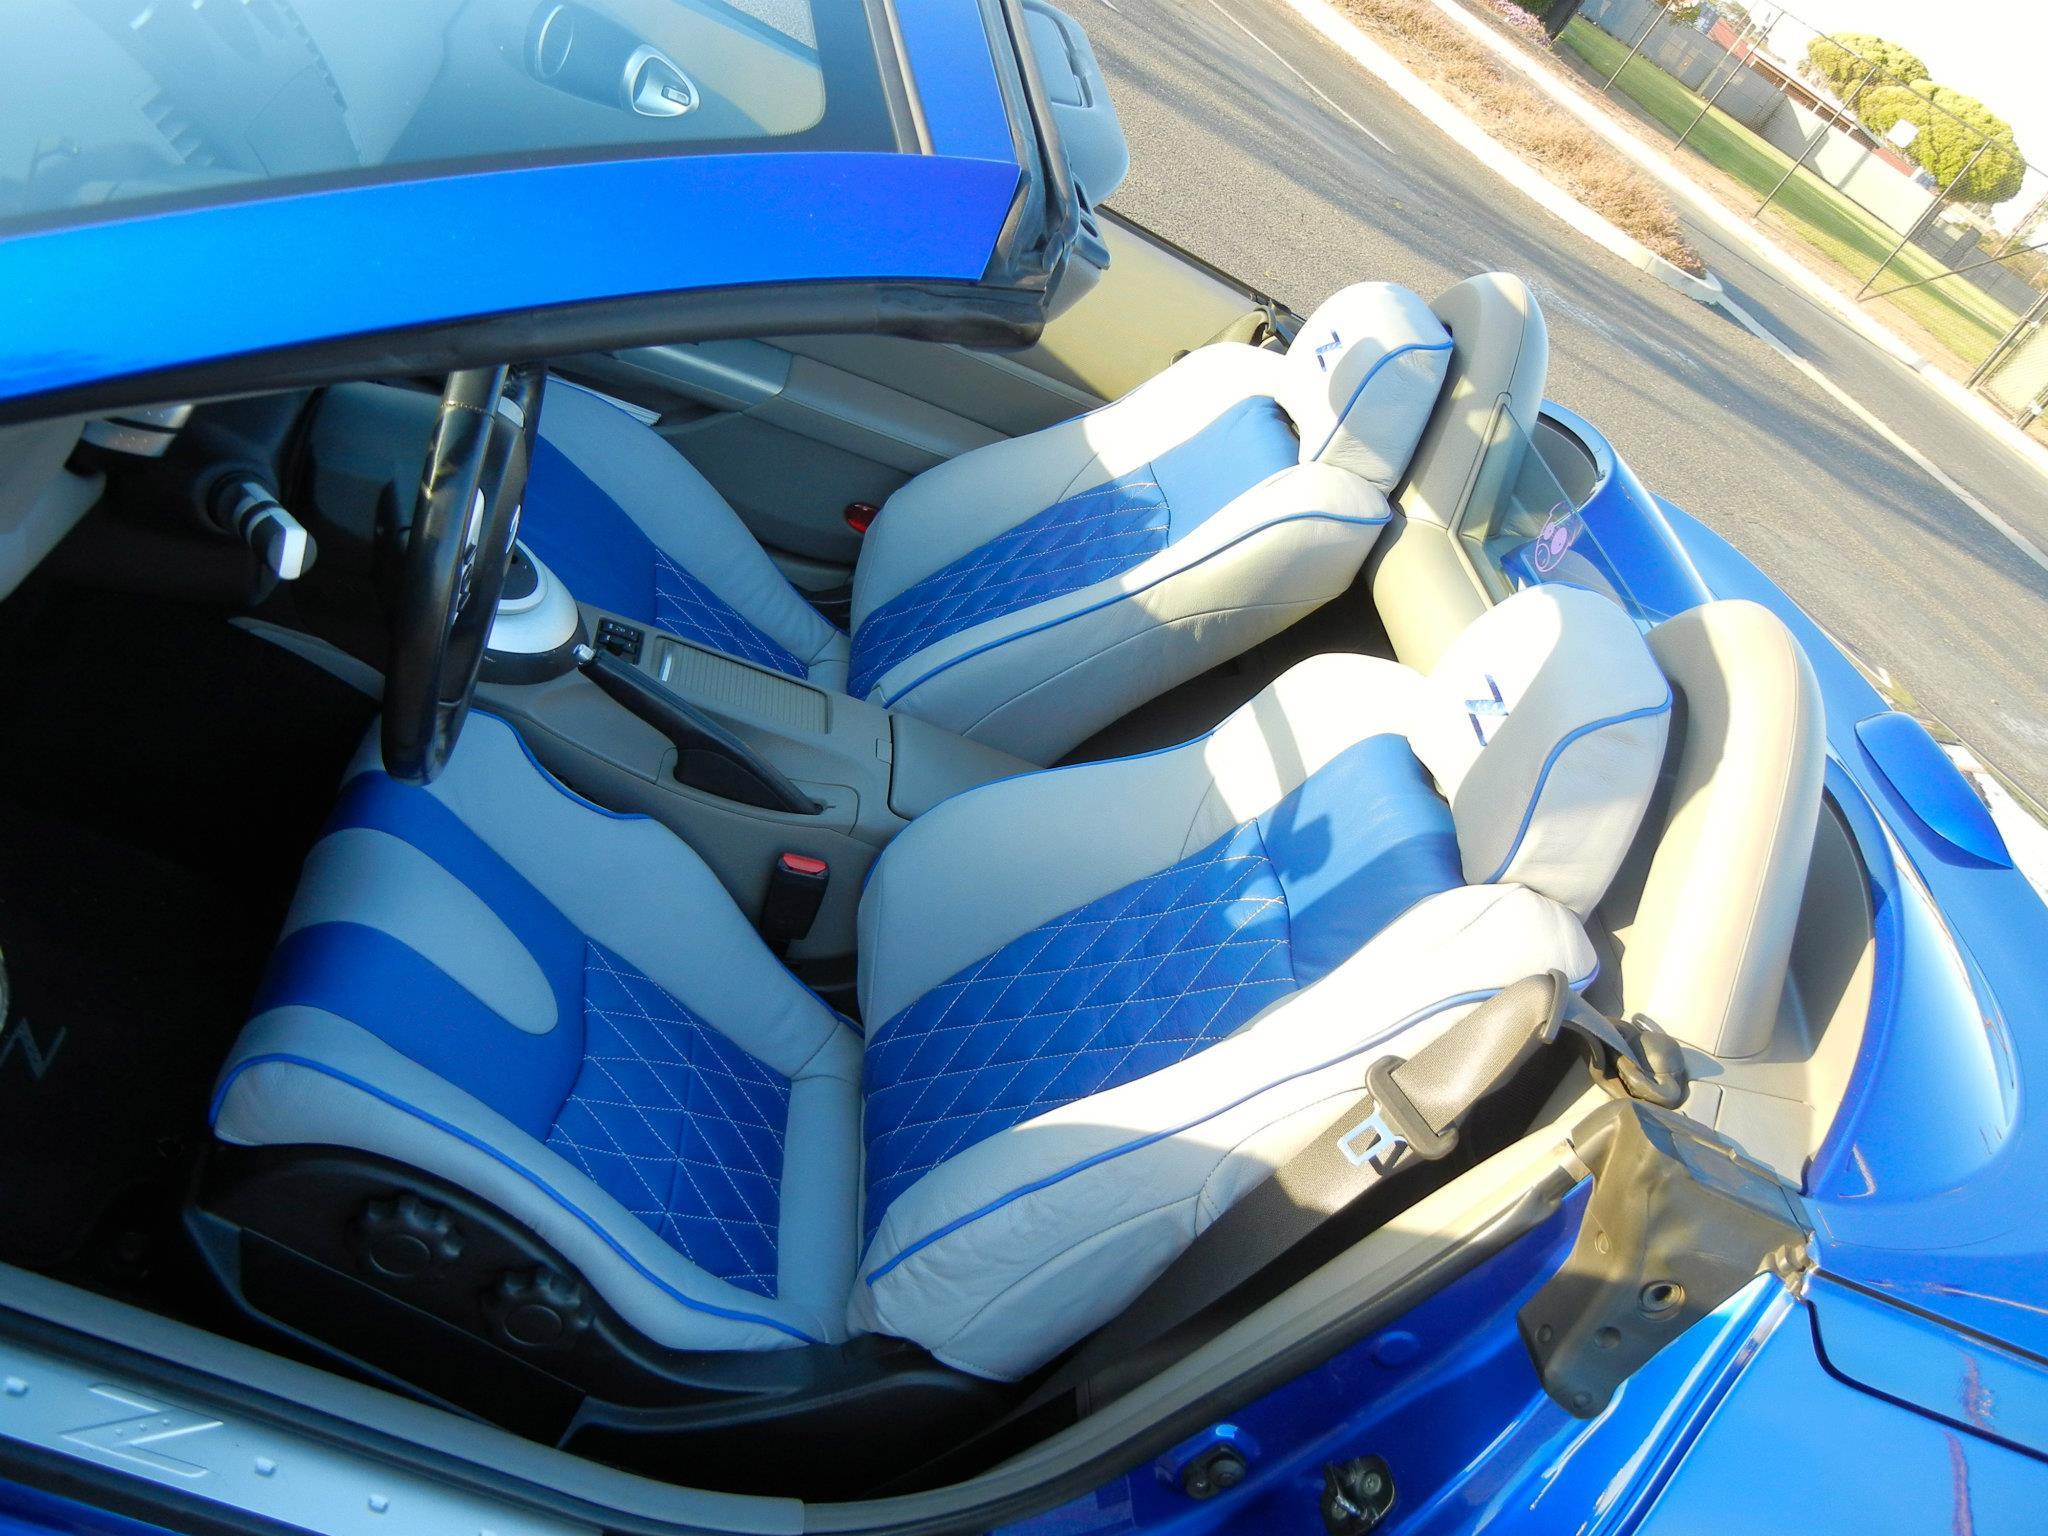 02 08 NISSAN 350Z GENUINE LEATHER SEAT COVERS CUSTOM